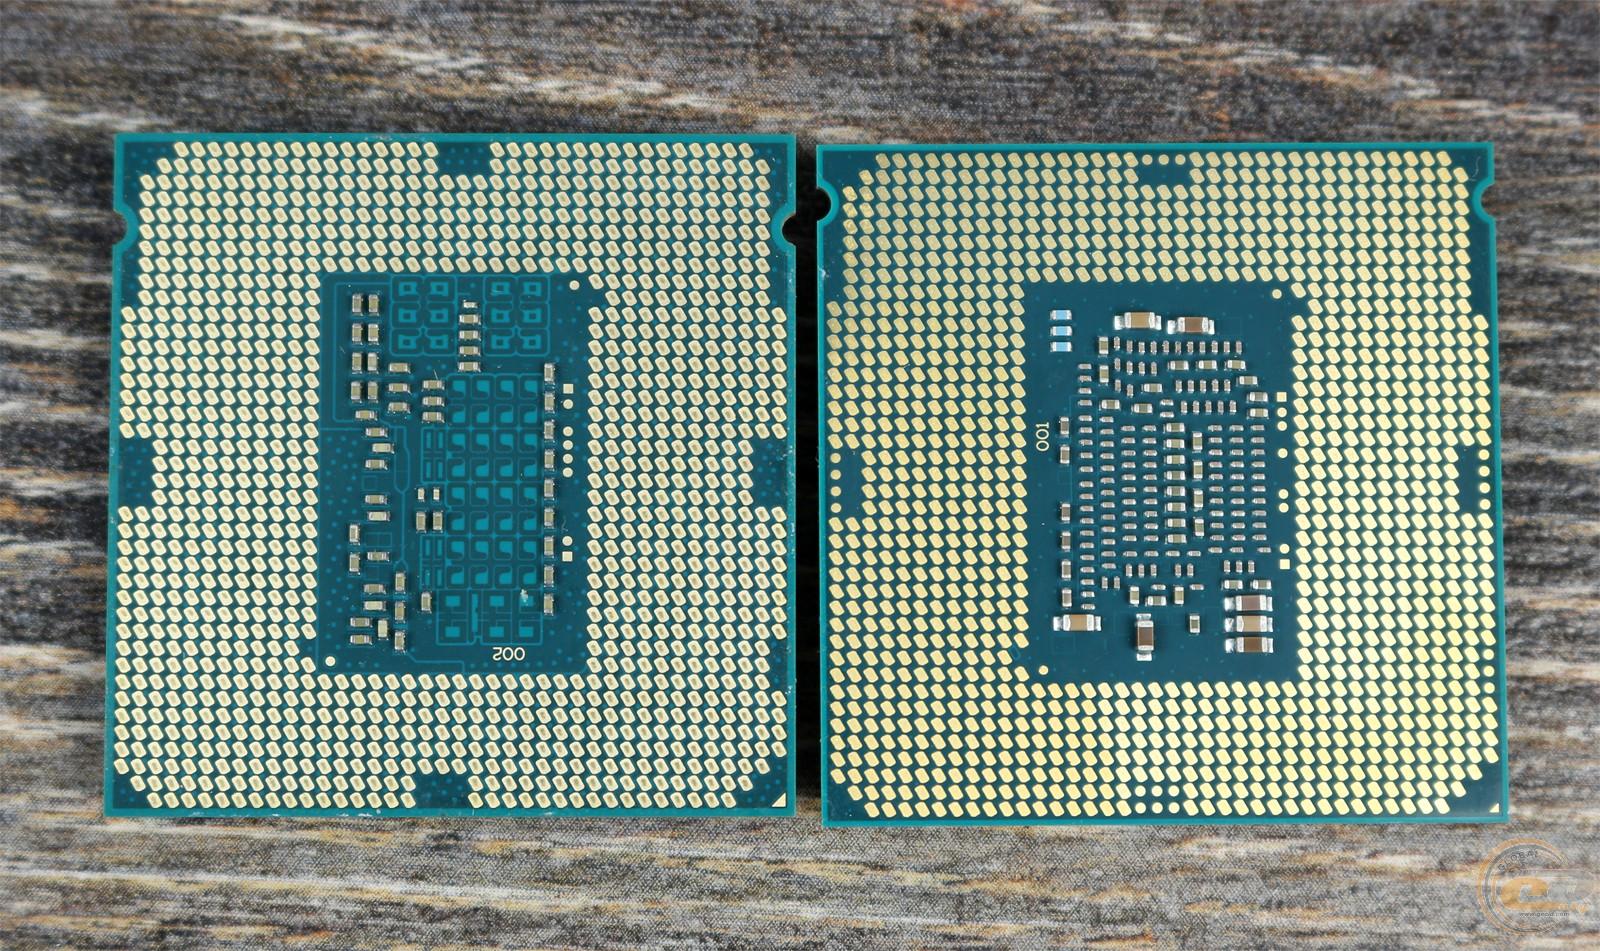 Intel Core I5 6600k Processor 35 Box Socket 1151